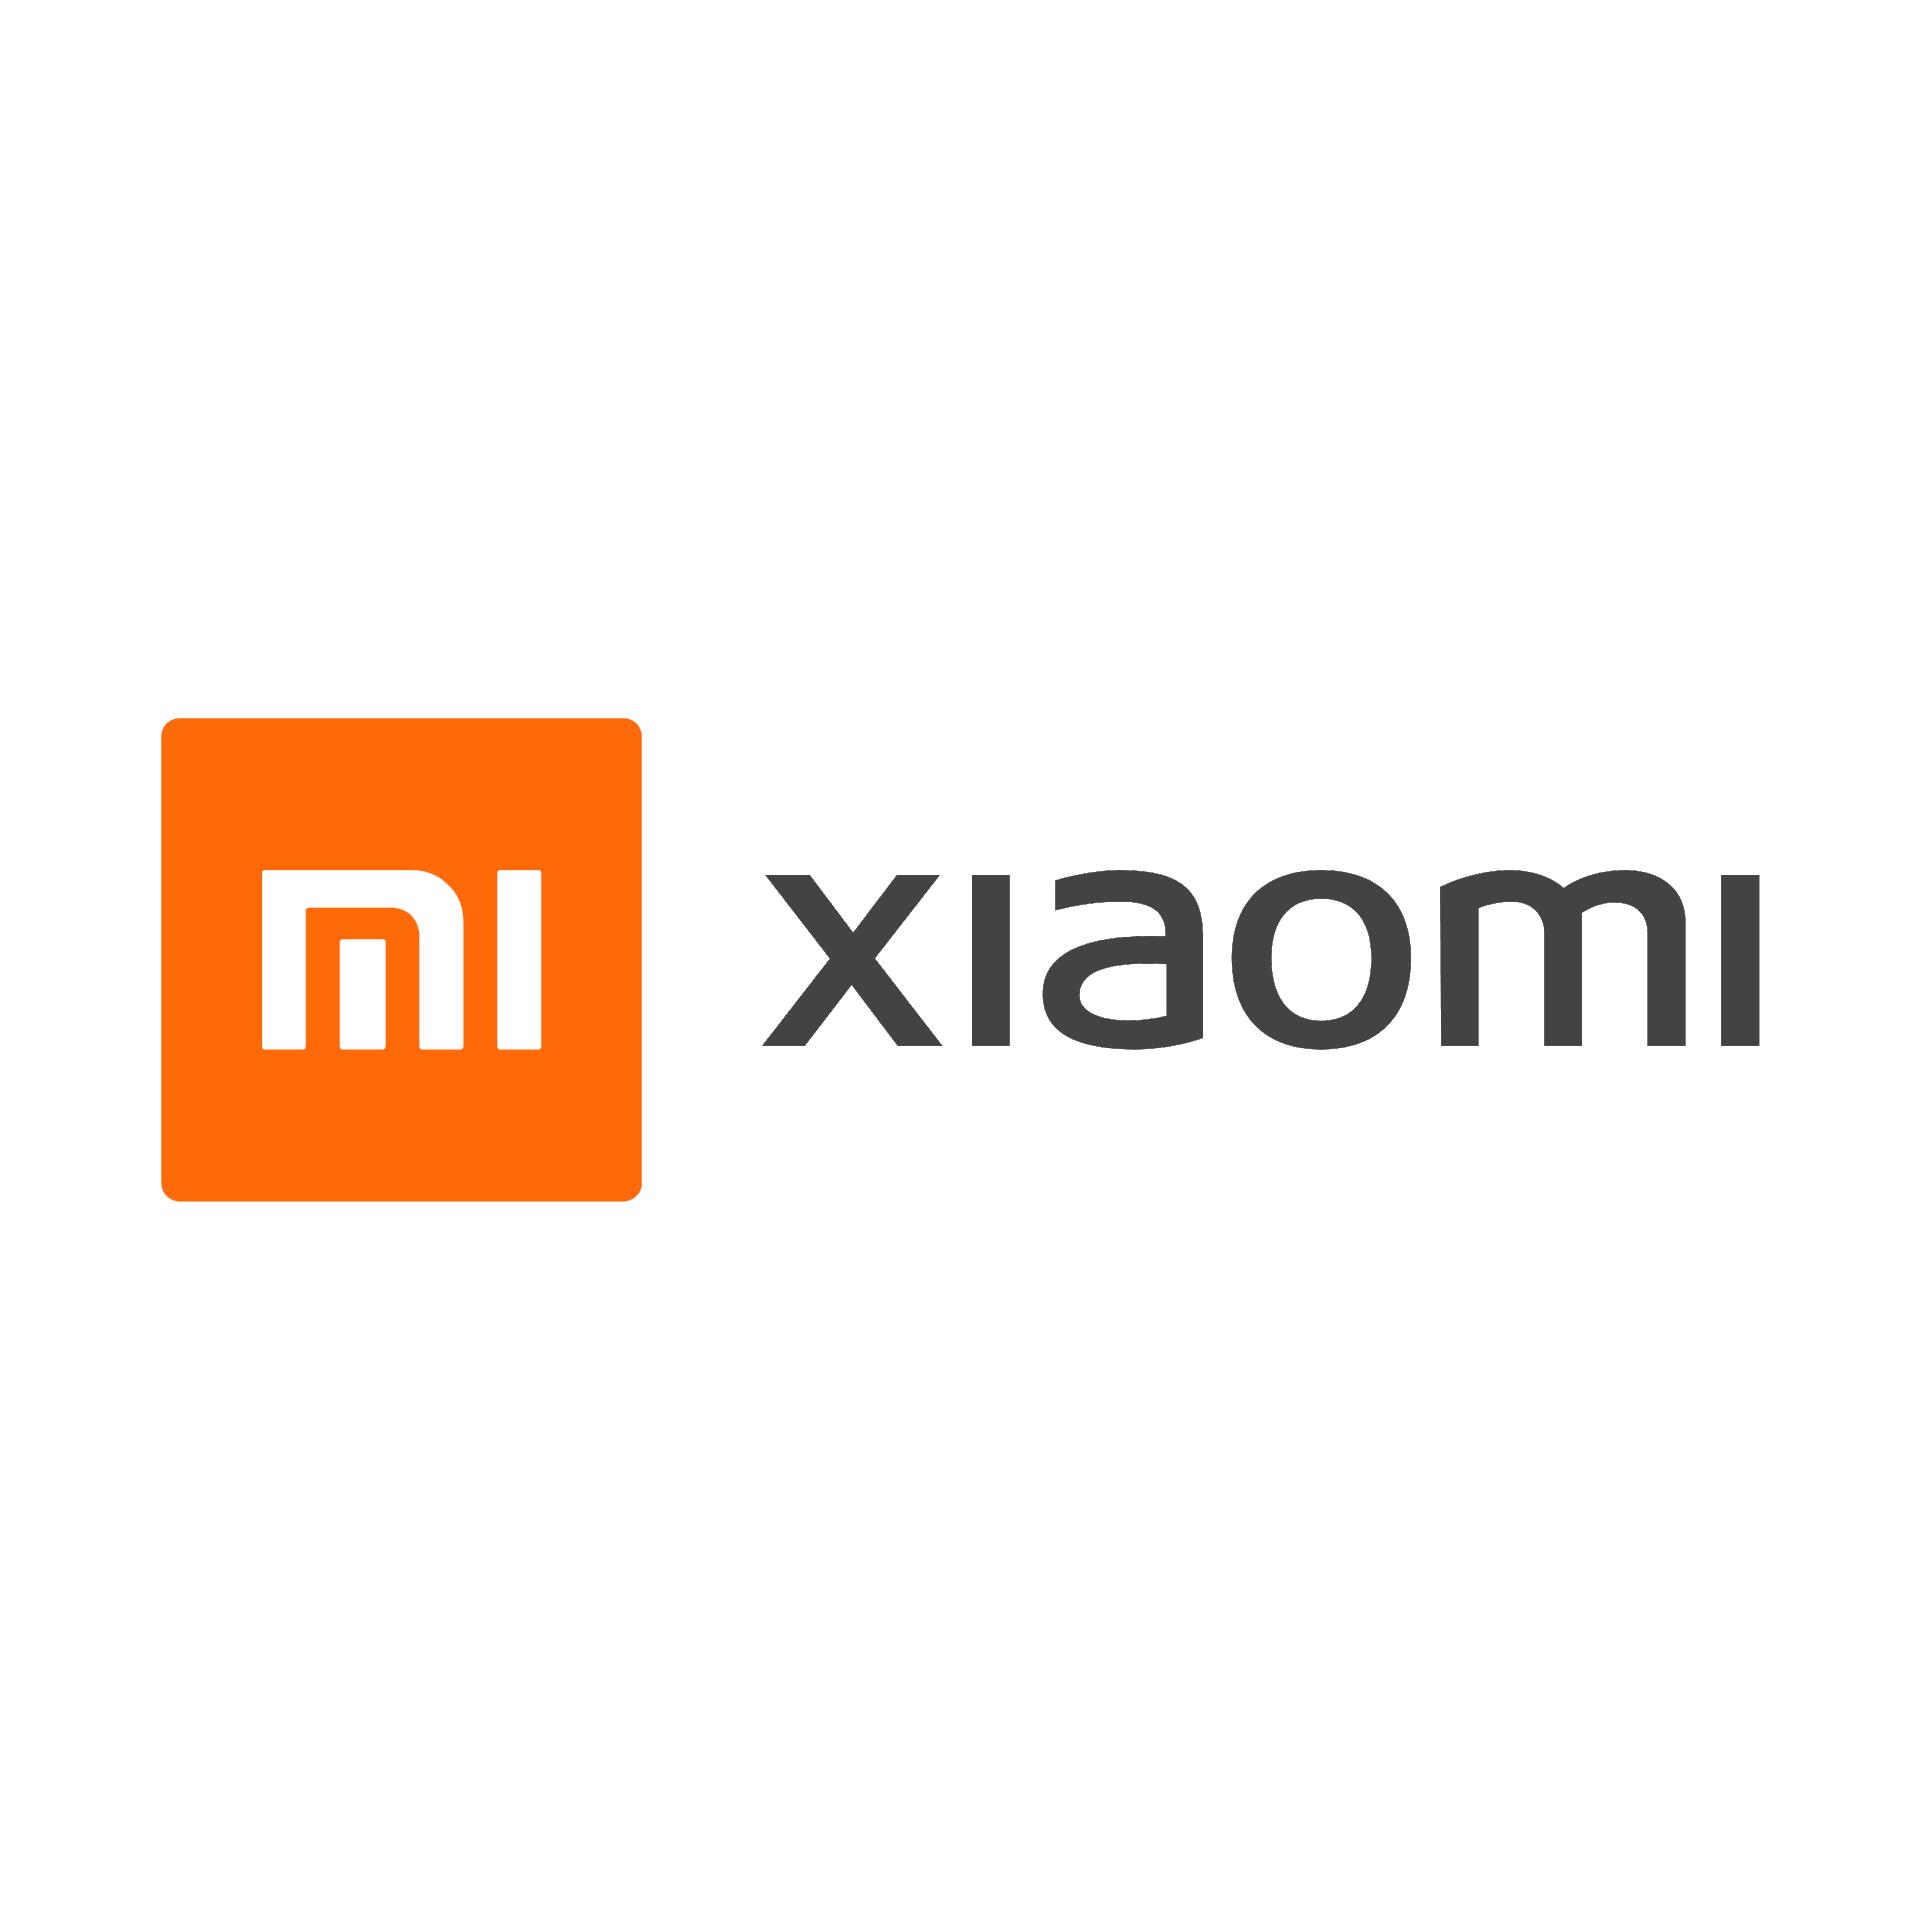 Xiaomi/Philips